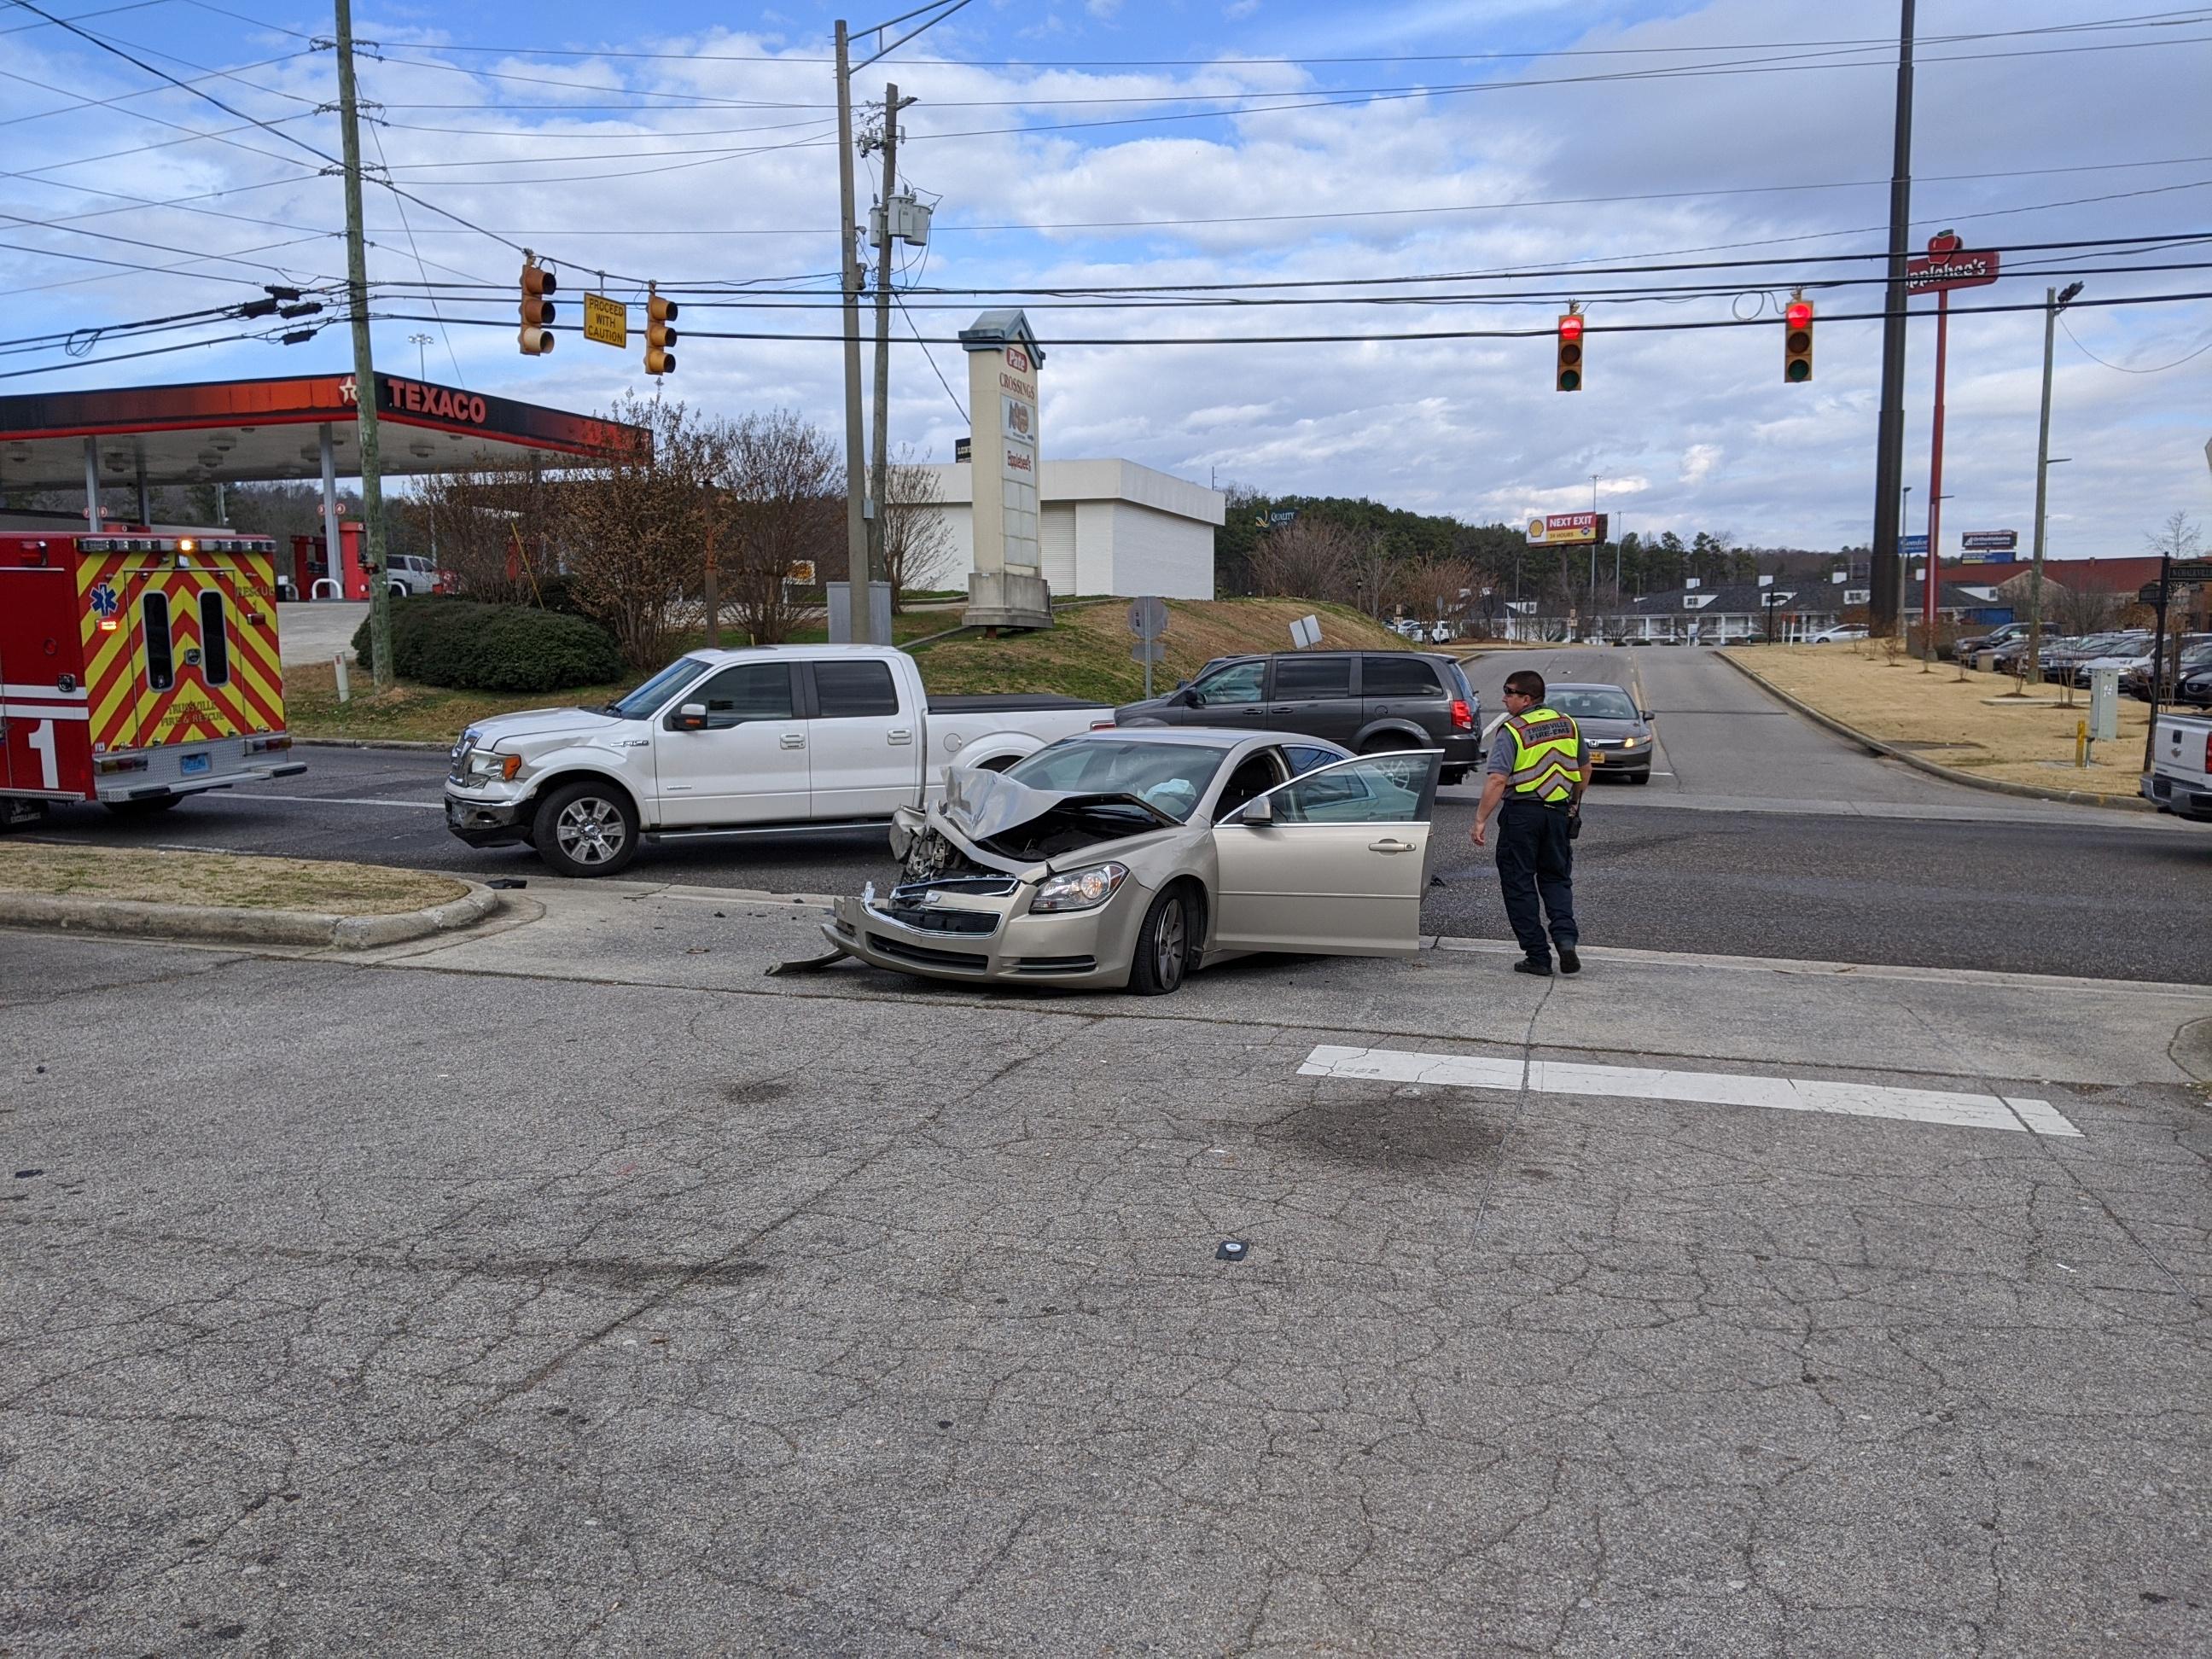 2 vehicle collision on North Chalkville slows traffic